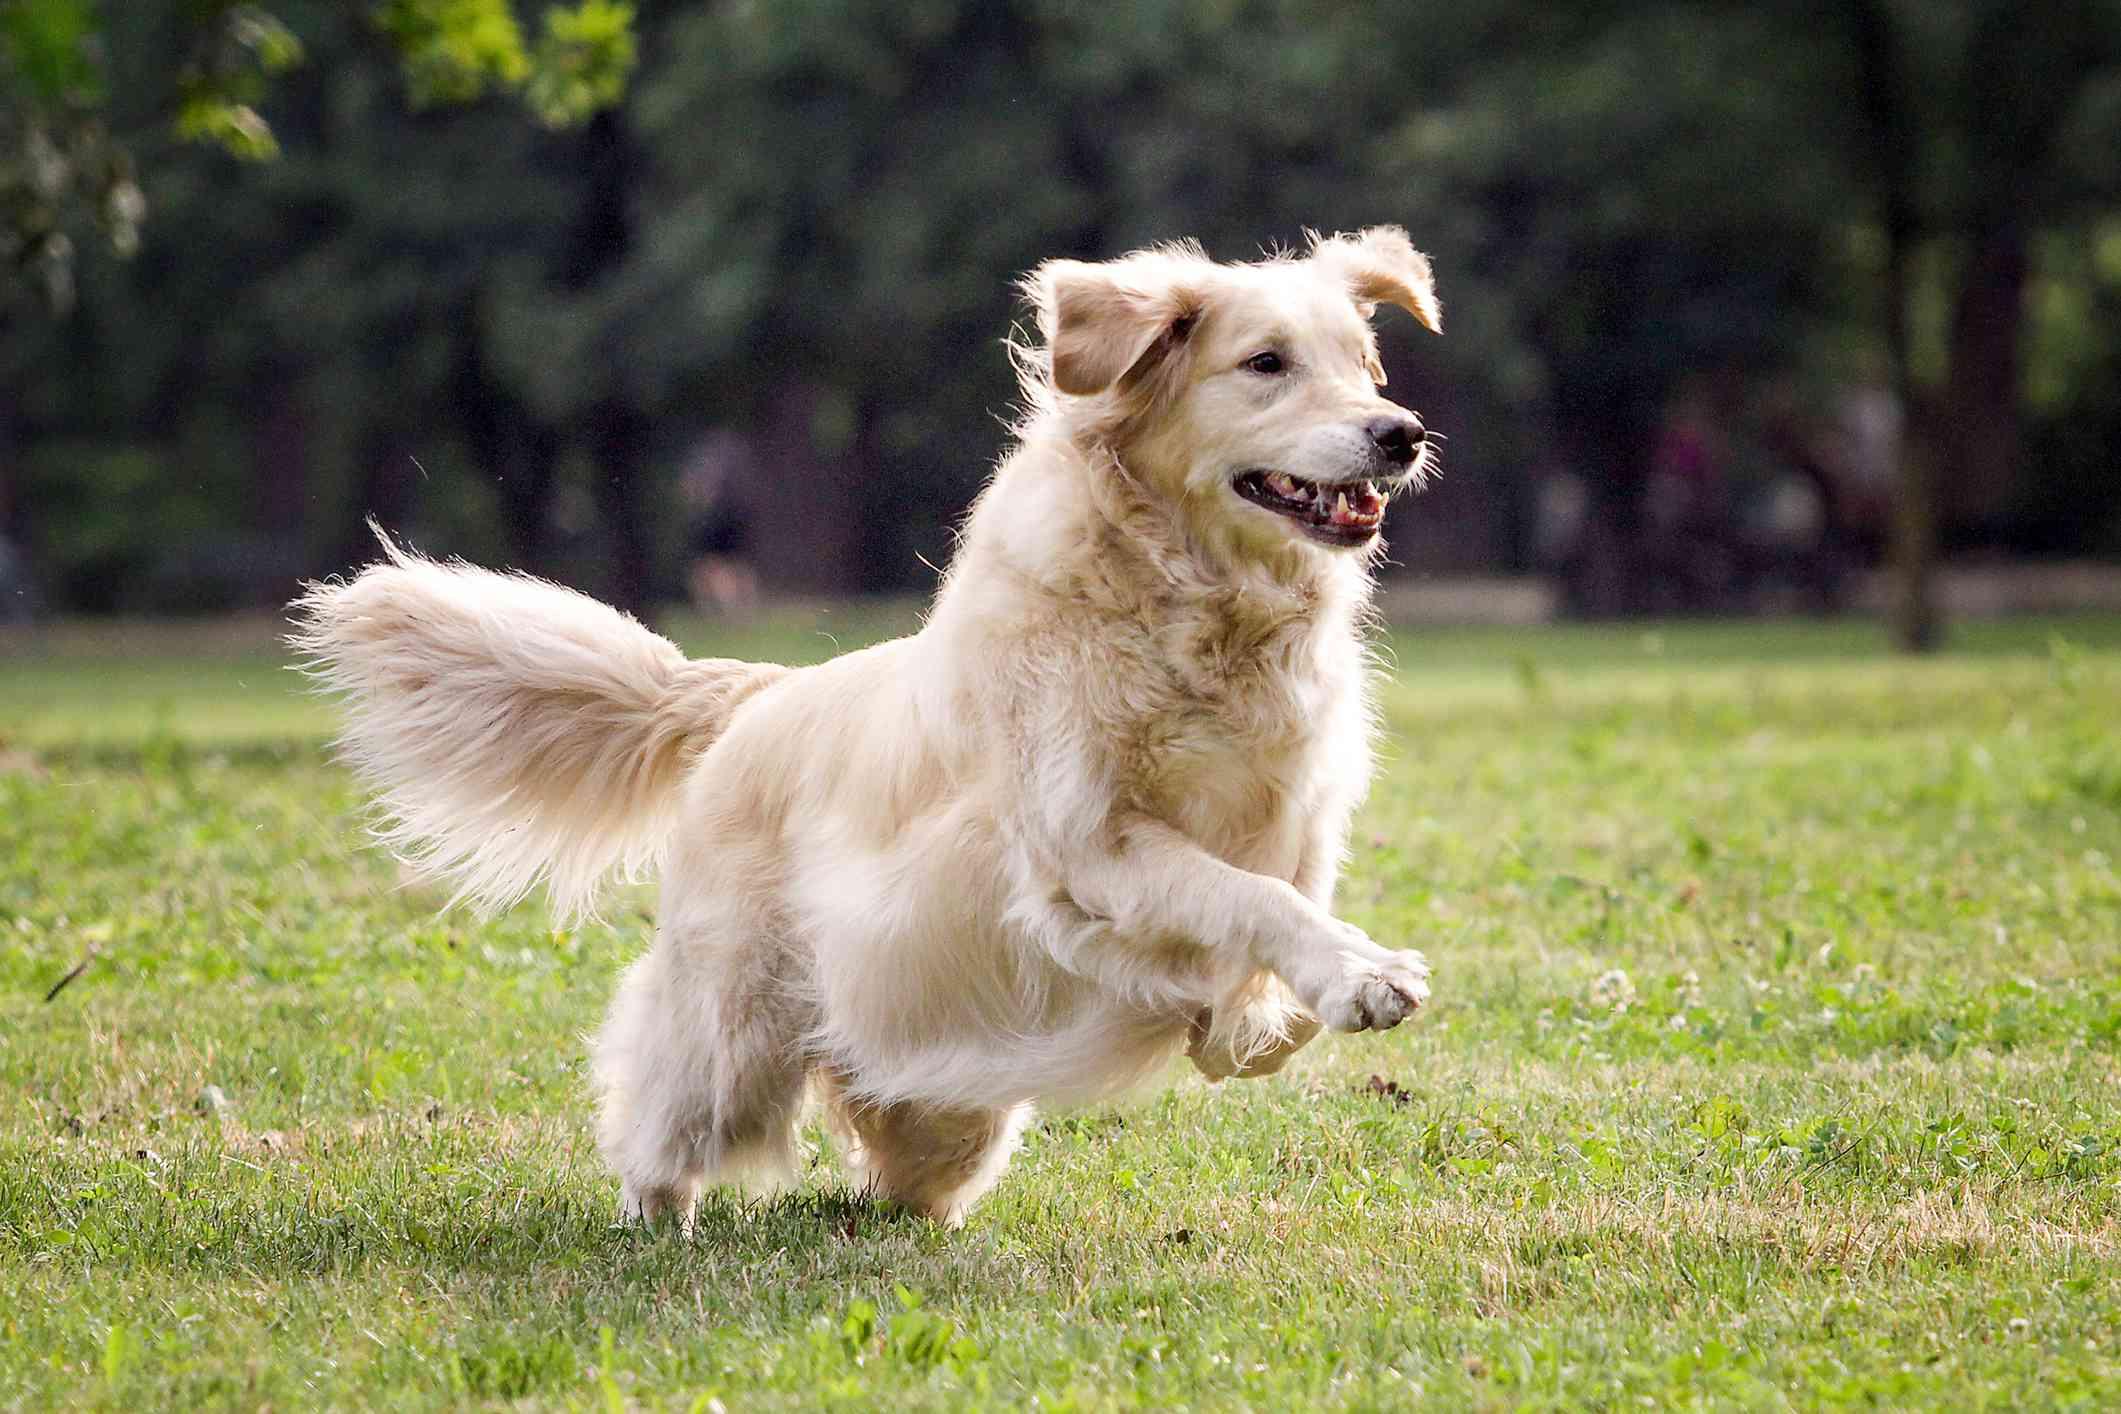 golden retriever mid-run, playing in grassy field